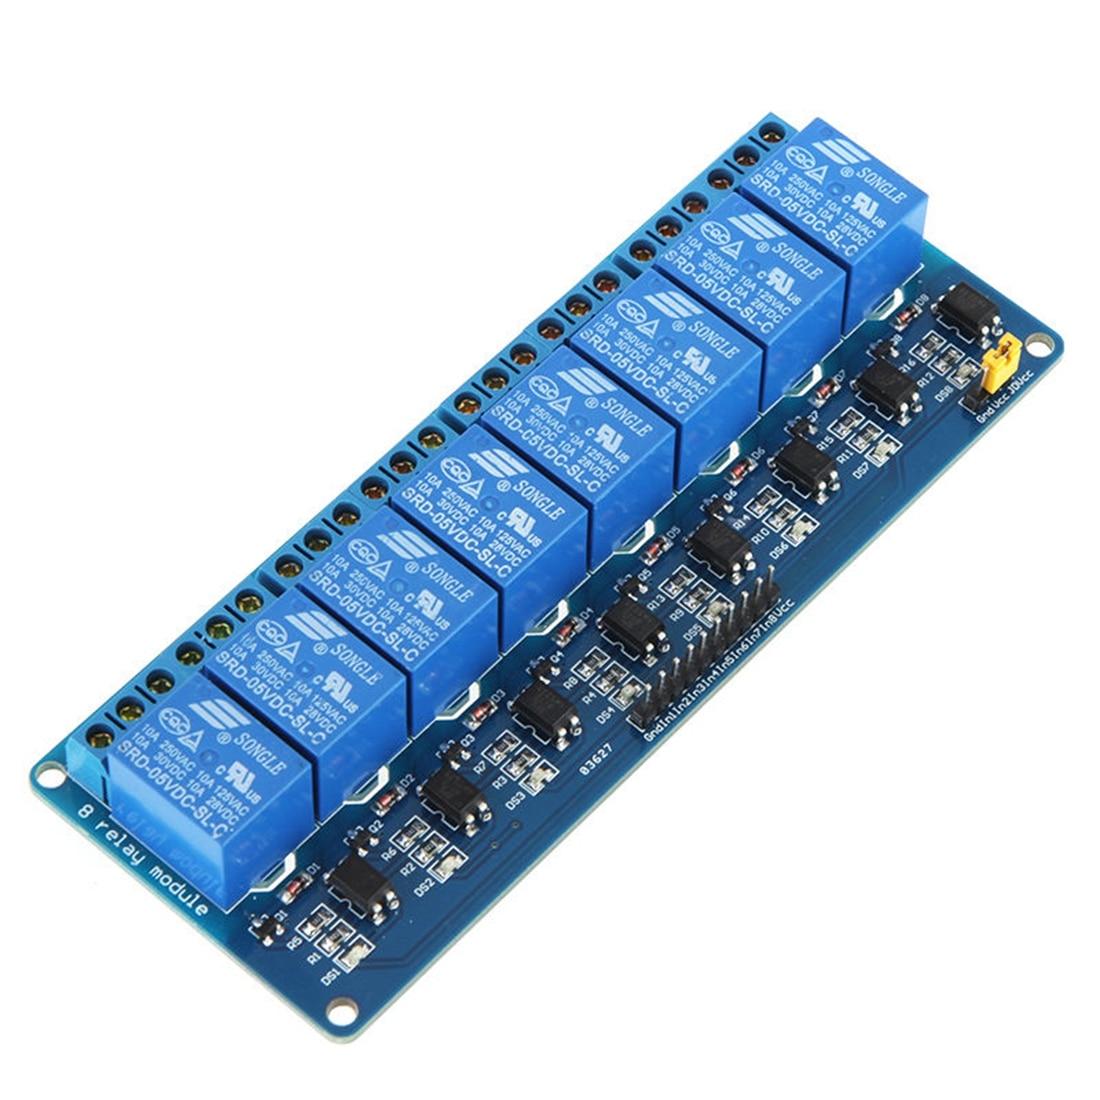 WSFS Hot 5V 8 Channel Relay Module Board For Arduino AVR PIC MCU DSP ARM  12v 8 channel relay module board for pic avr mcu dsp arm electronic new original